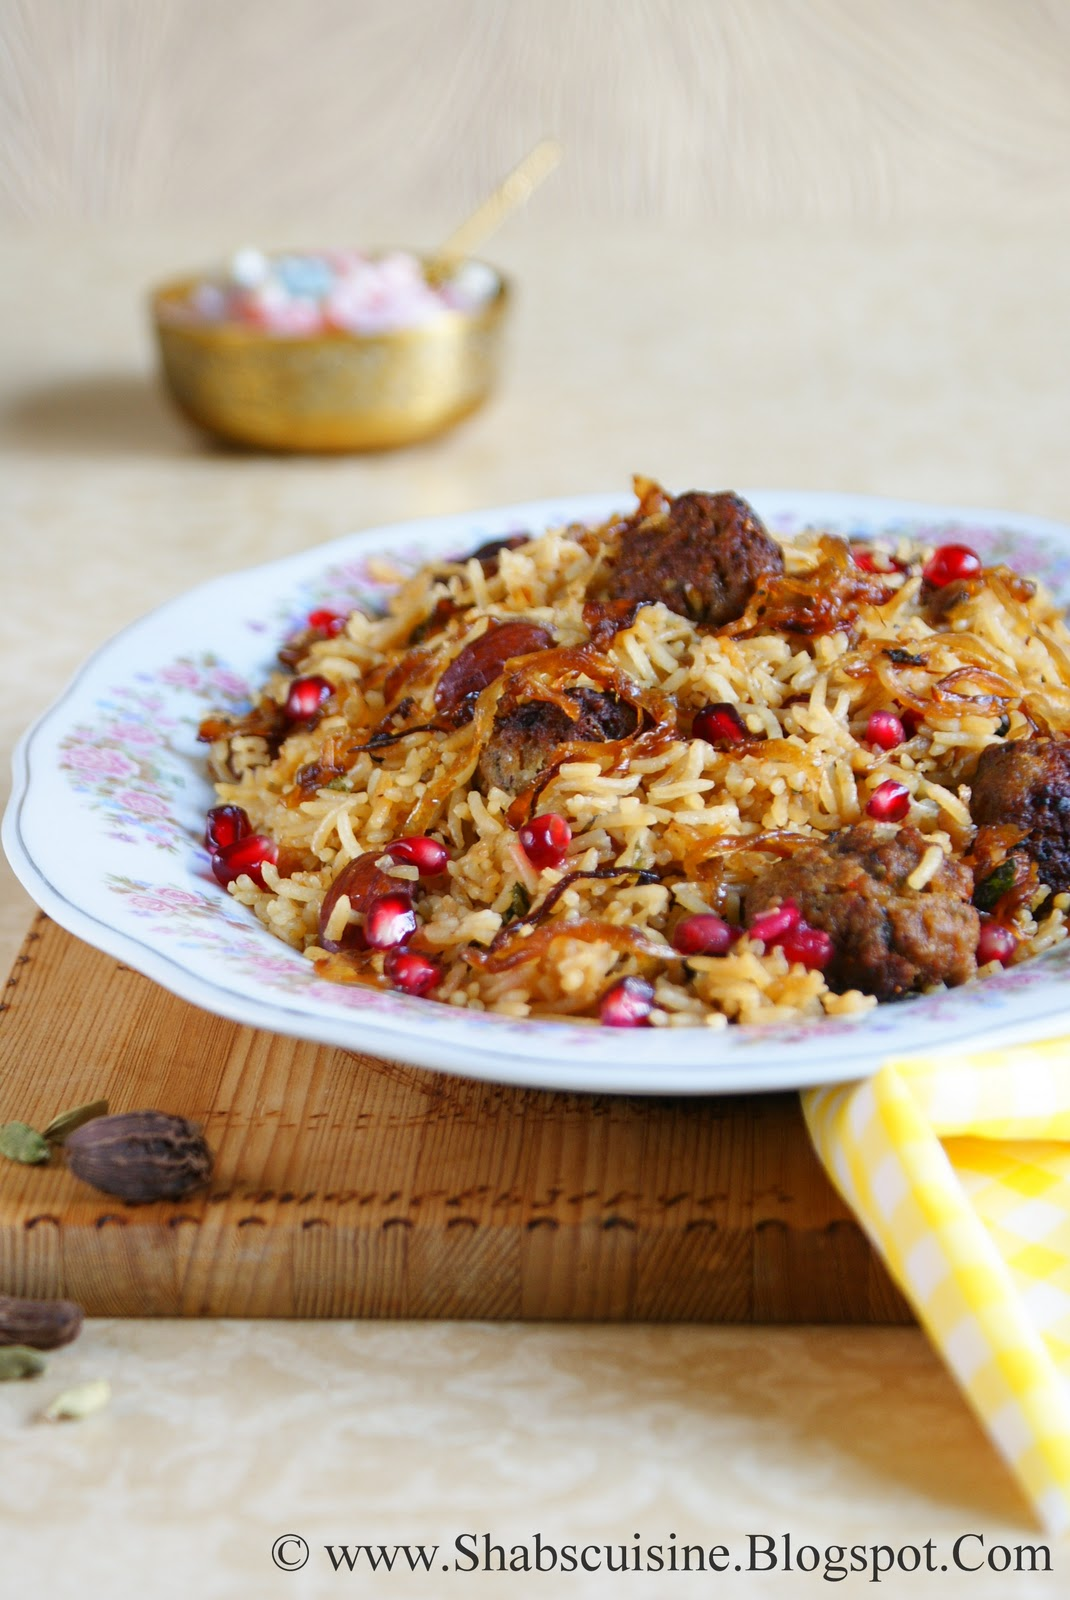 Shab's Cuisine: Kofta Pulao